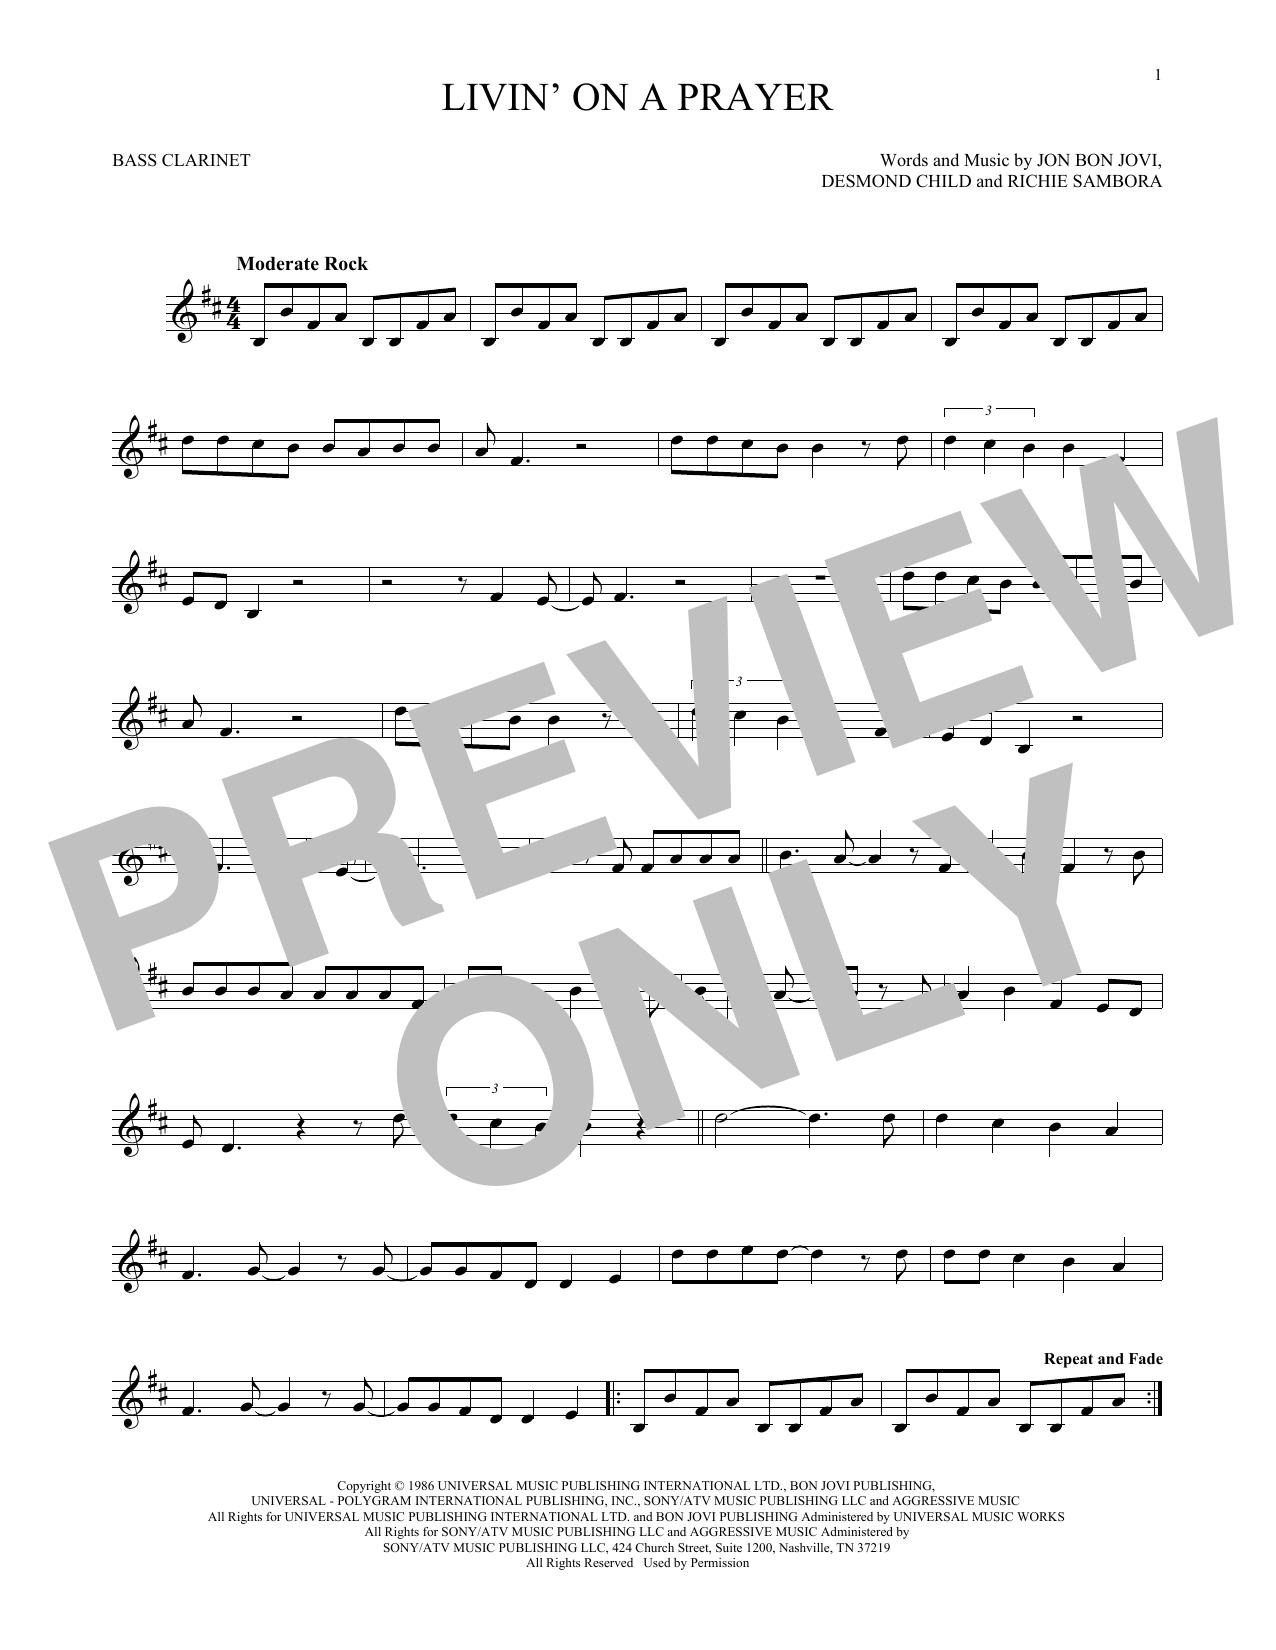 Livin' On A Prayer (Bass Clarinet Solo)